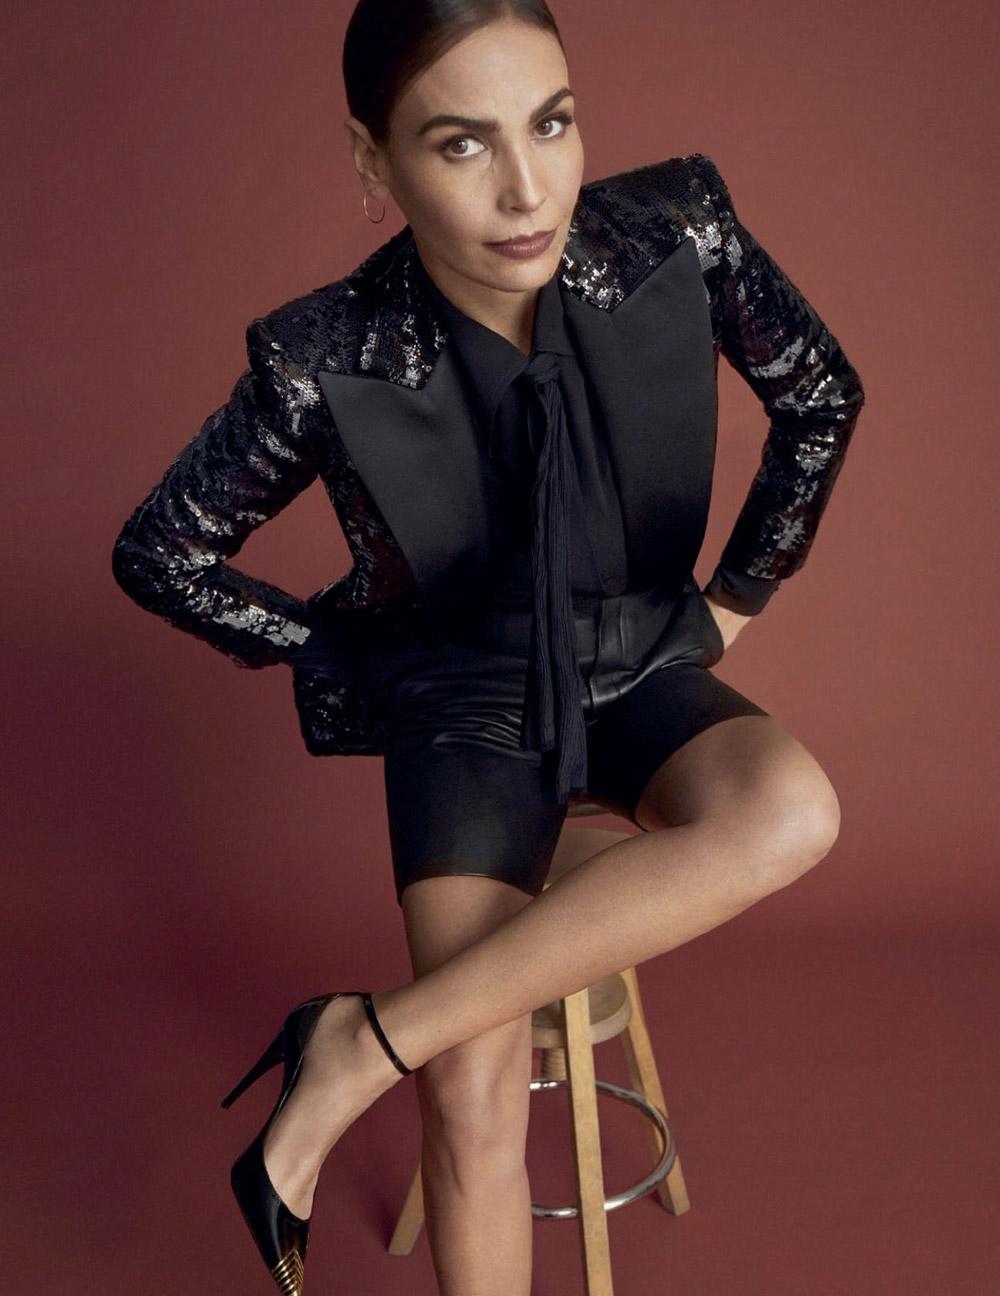 Inés Sastre covers Harper's Bazaar Spain May 2020 by Xavi Gordo